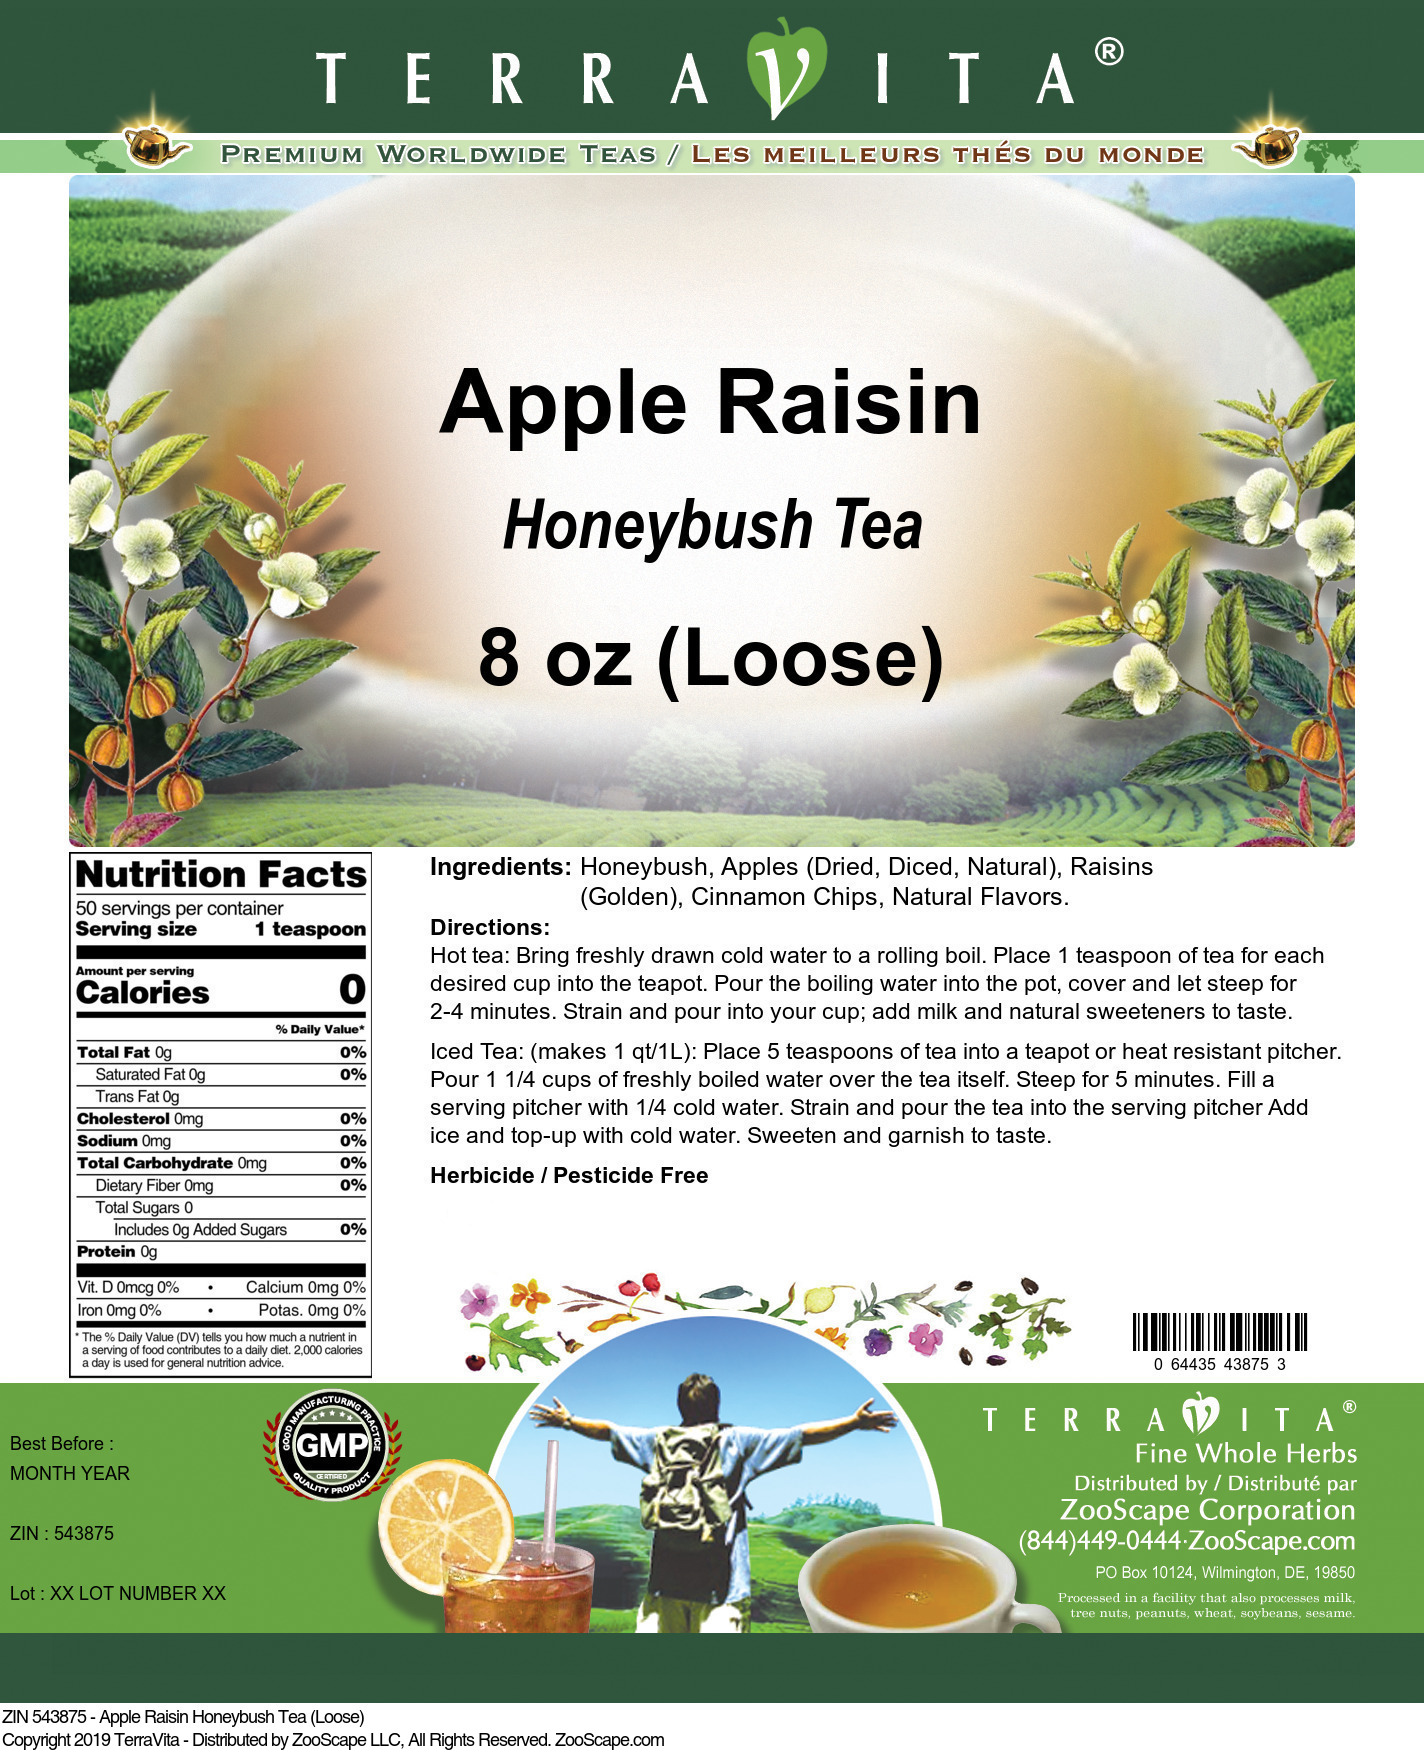 Apple Raisin Honeybush Tea (Loose)